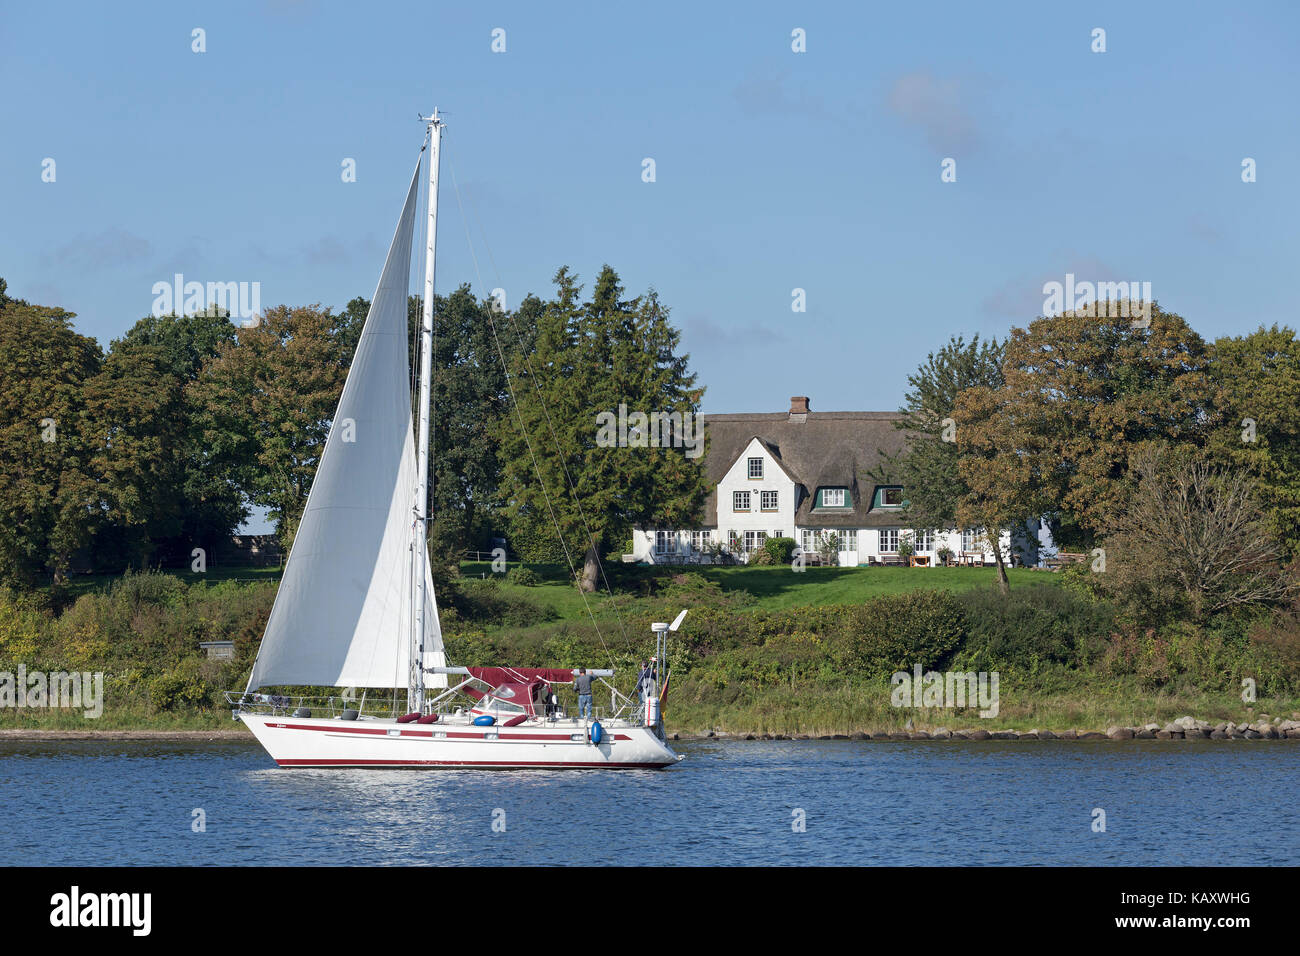 sailing boat, Rabelsund, Schlei, Schleswig-Holstein, Germany - Stock Image